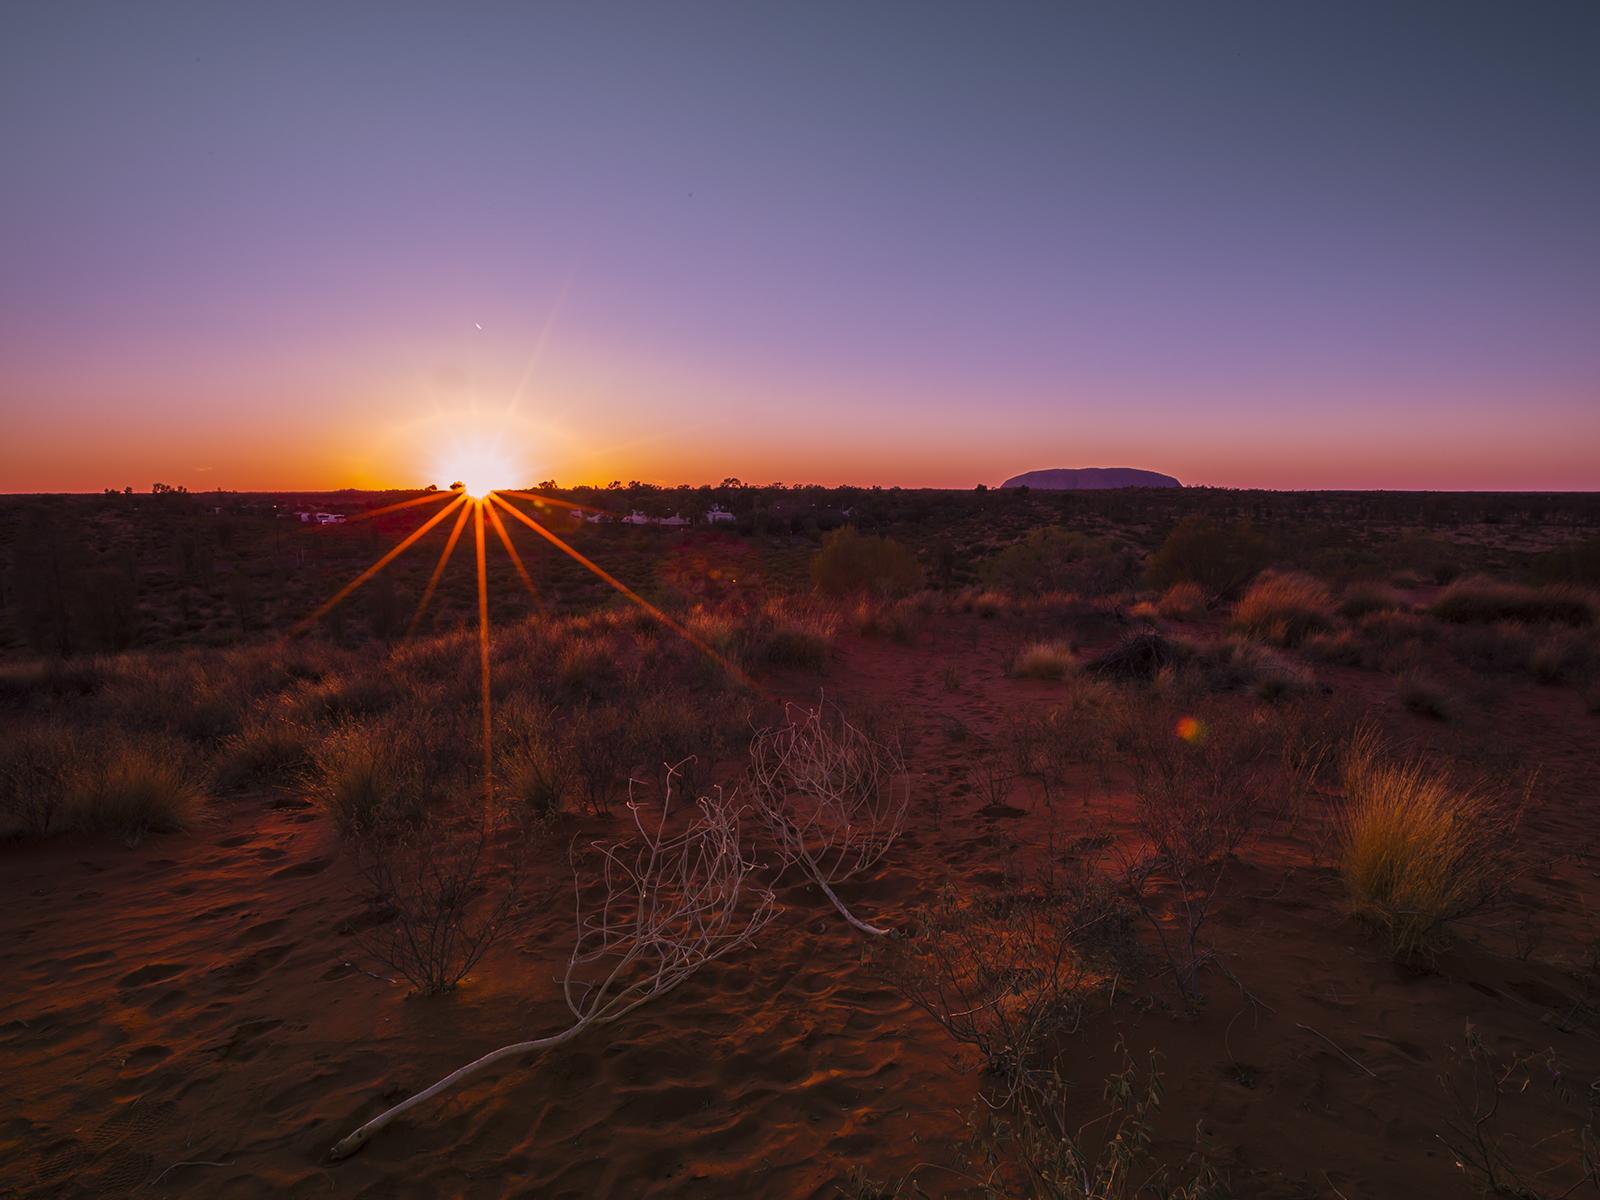 Ayers Rock at Sunrise by icedragonpeach